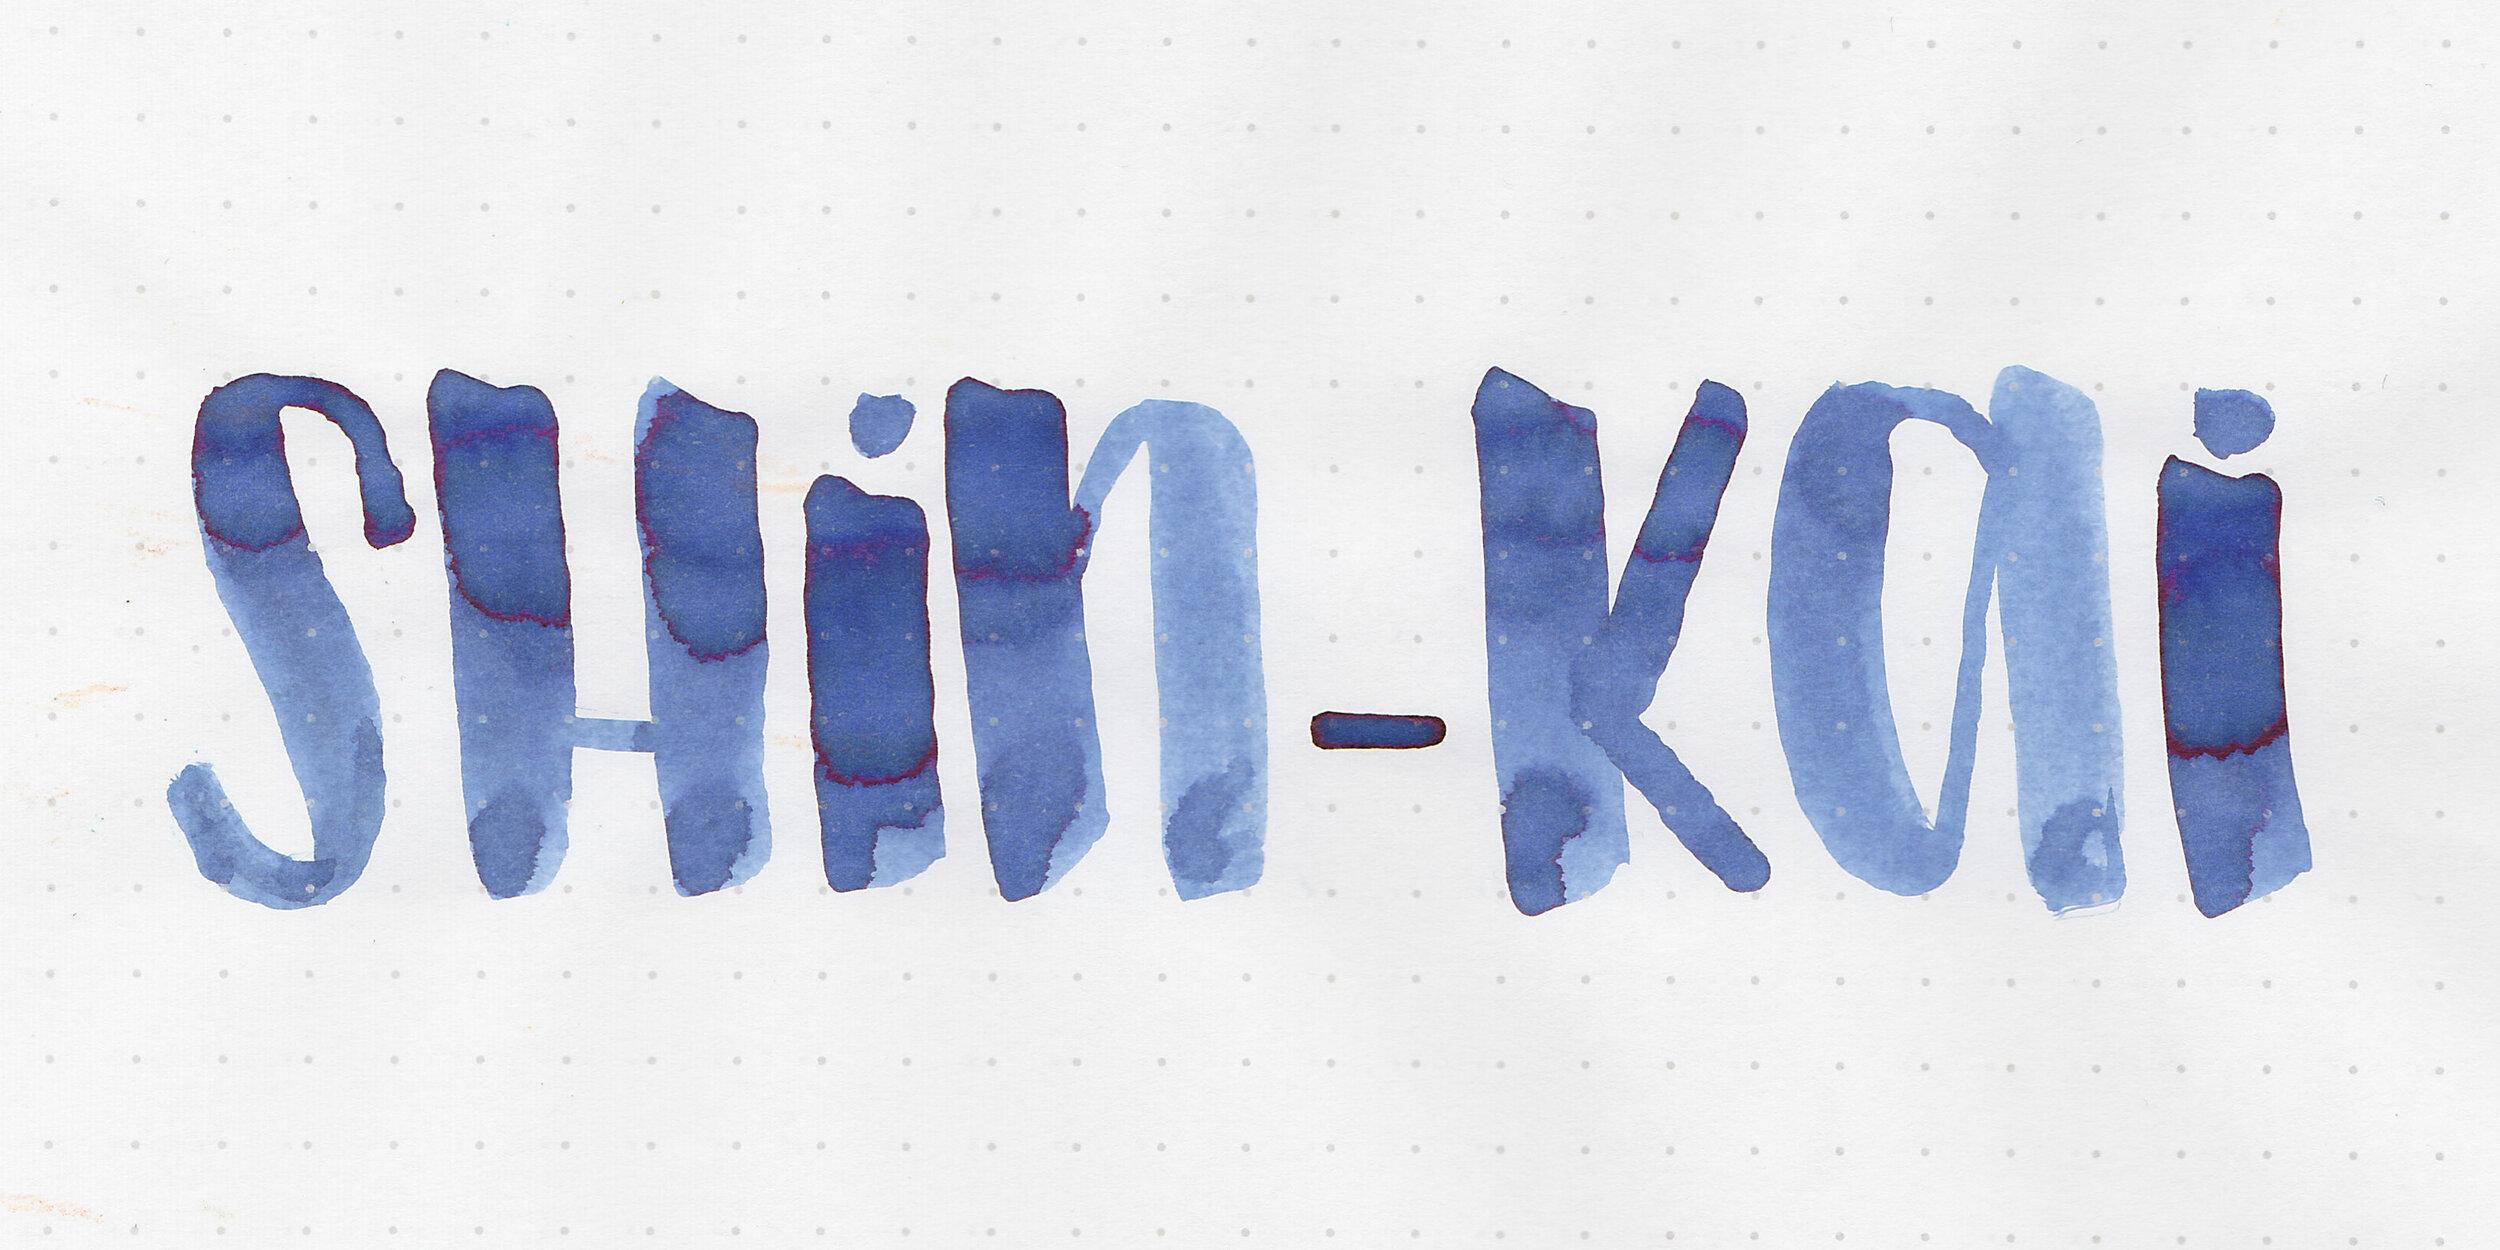 pi-shin-kai-2.jpg